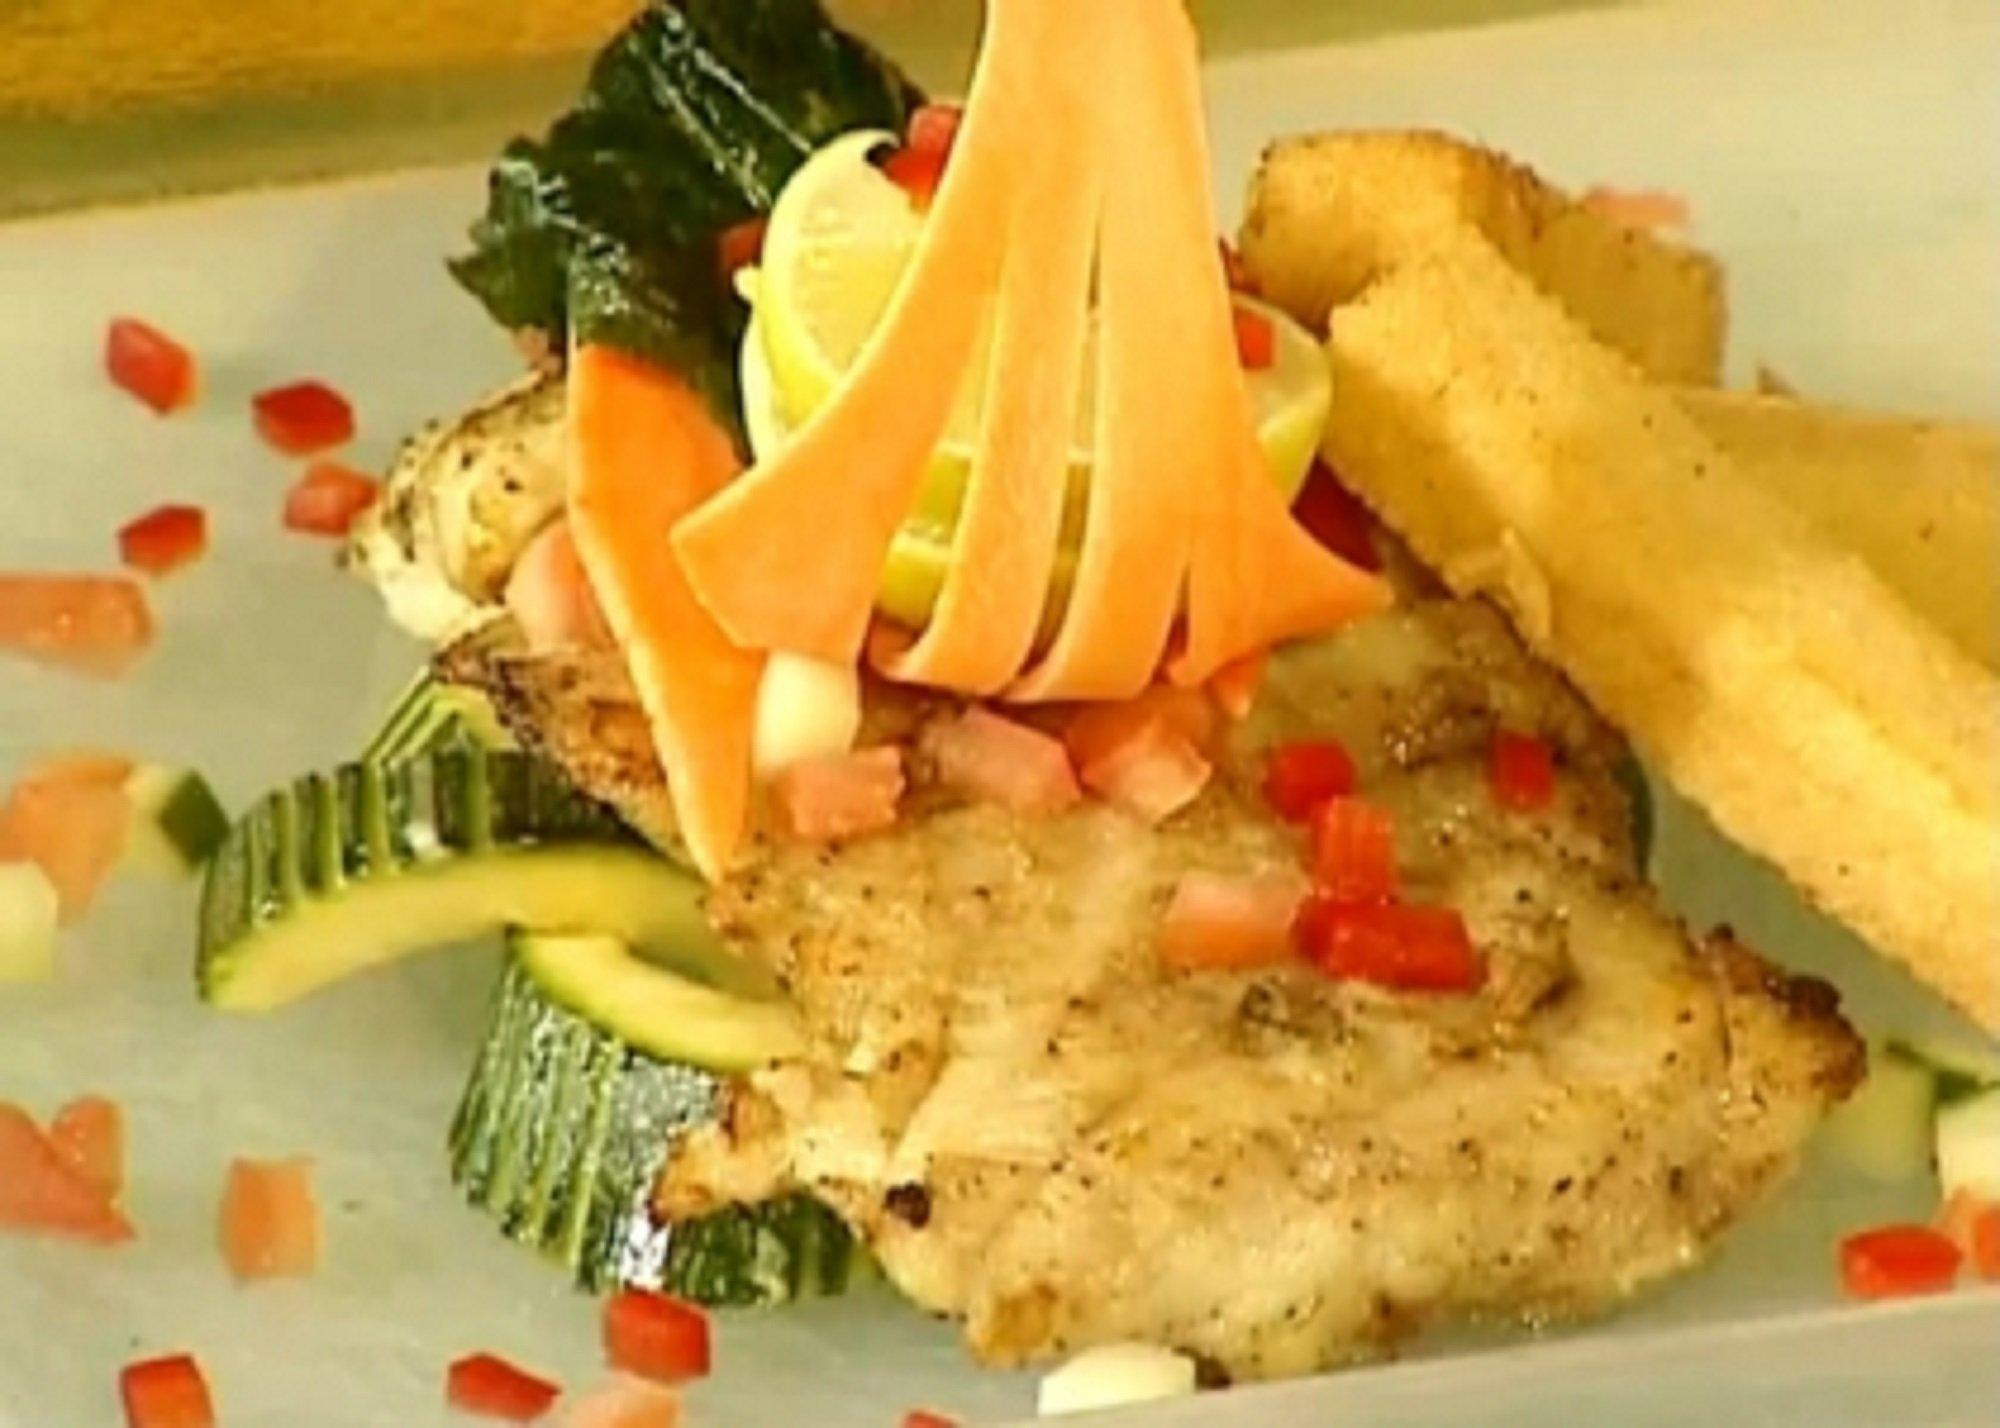 Grace Jerk Seasoning - Mild - 12 Pack x 10 oz - Authentic Jamaican Jerk Sauce - Great Jerk Marinade for Jerk Chicken, Pork, Fish, Vegetables, Tofu and More - Bonus Jerk Cooking Recipe Book by Grace (Image #6)